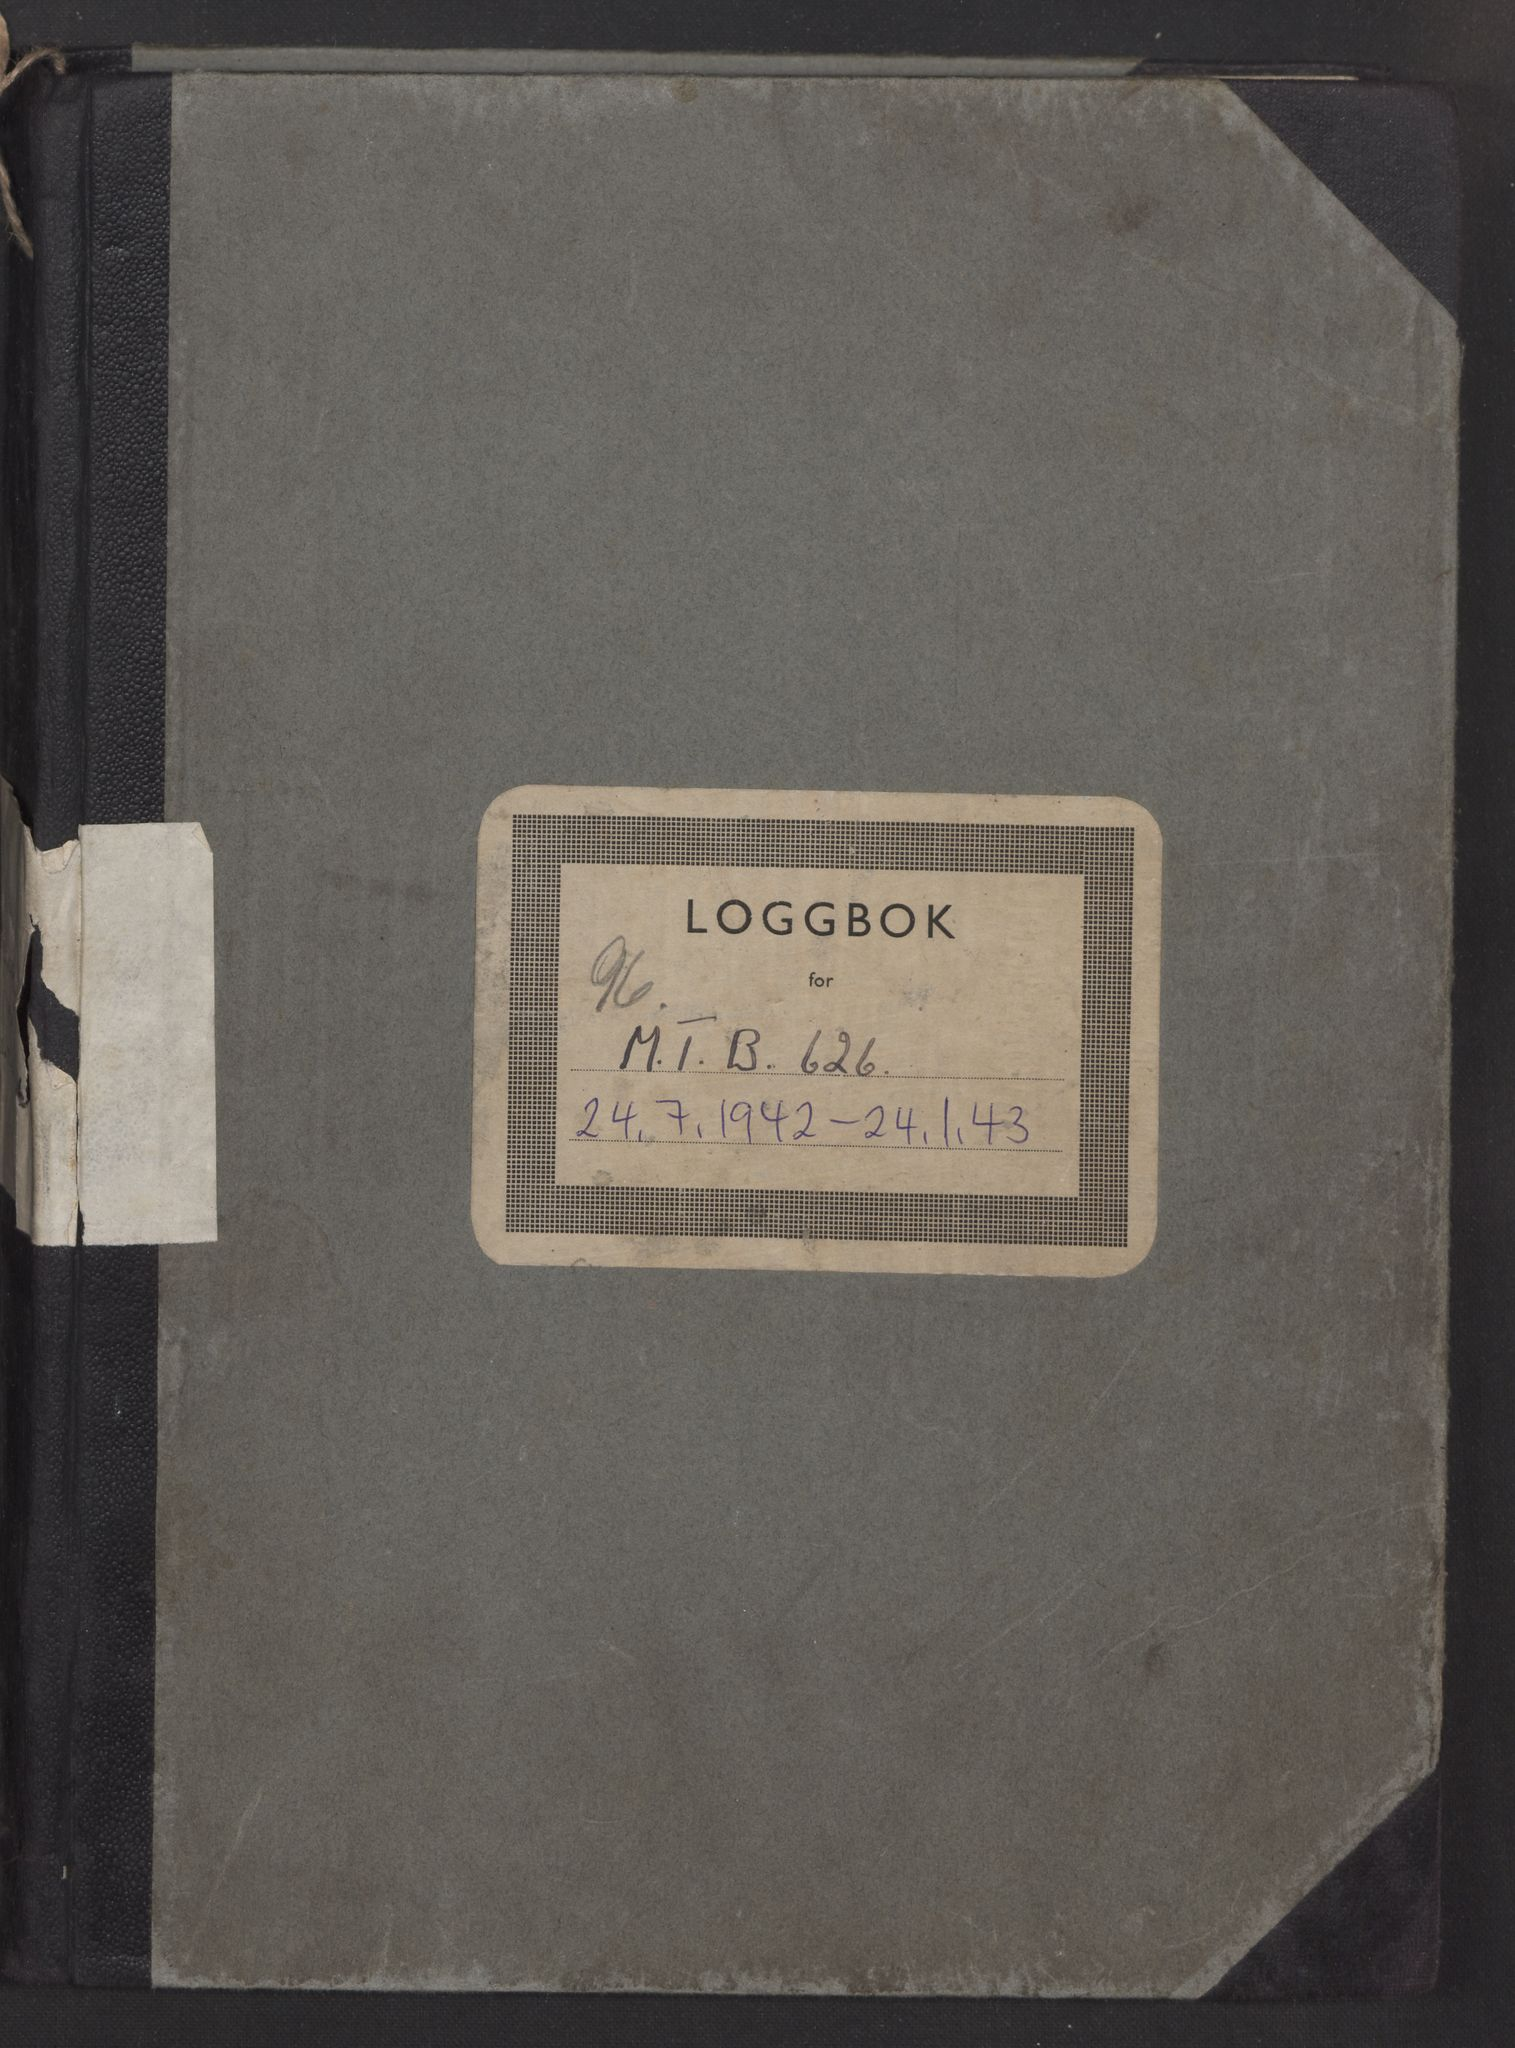 RA, Forsvaret, Sjøforsvarets fartøyer, Gm6/L0001: Loggbok, 1942-1943